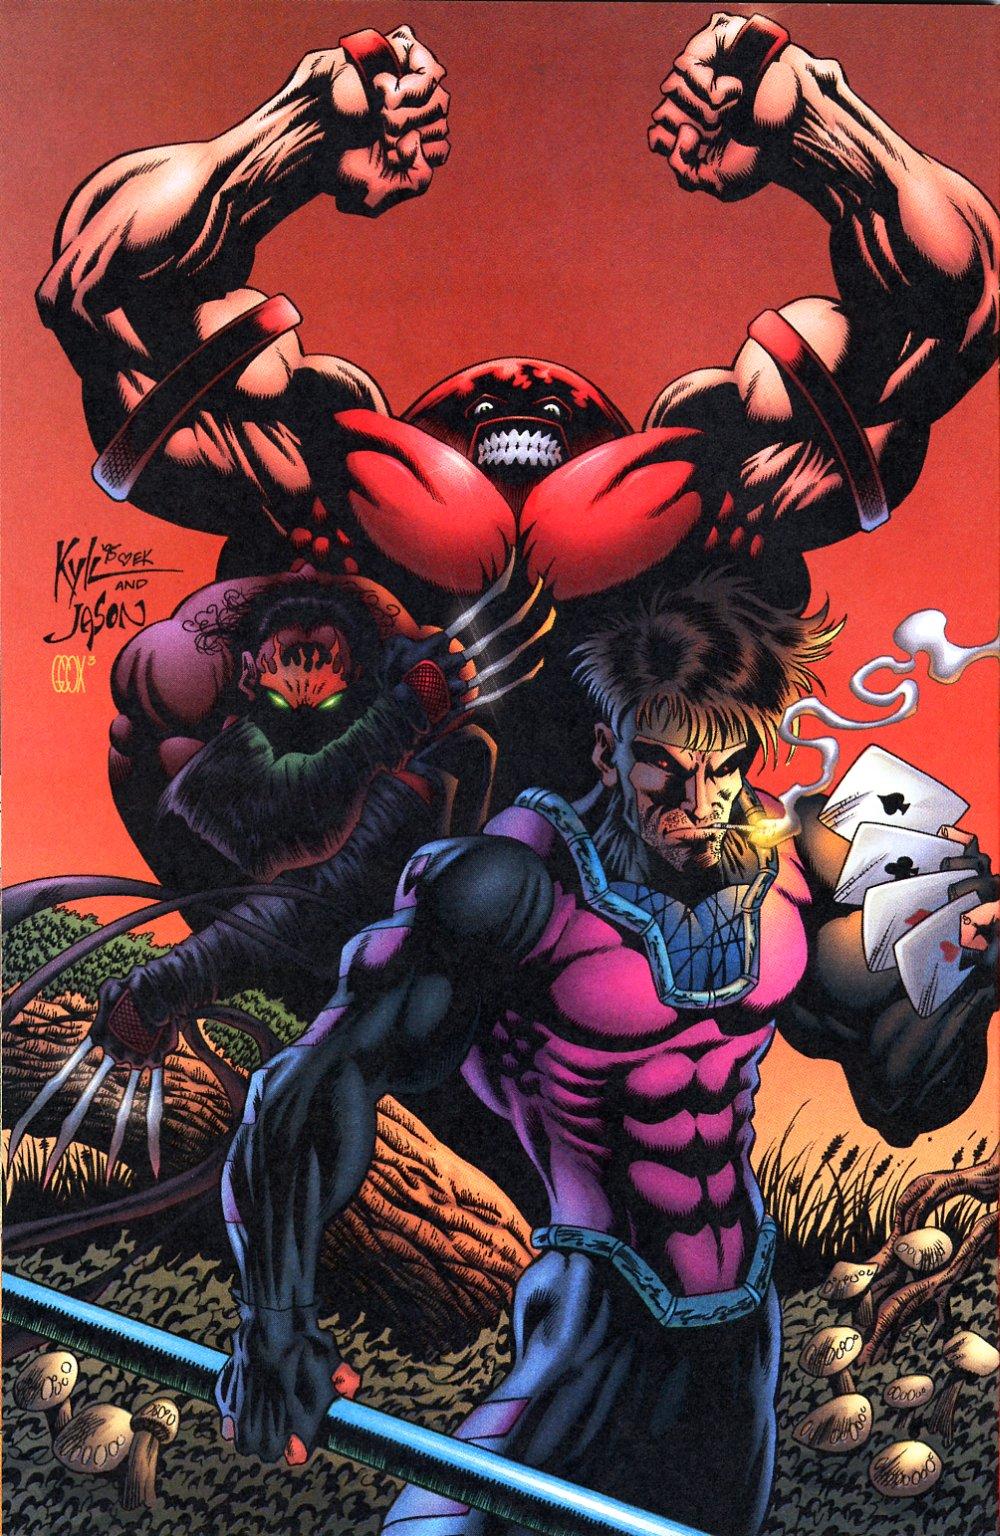 All New Exiles Vs. X-Men Vol 1 0 page 24